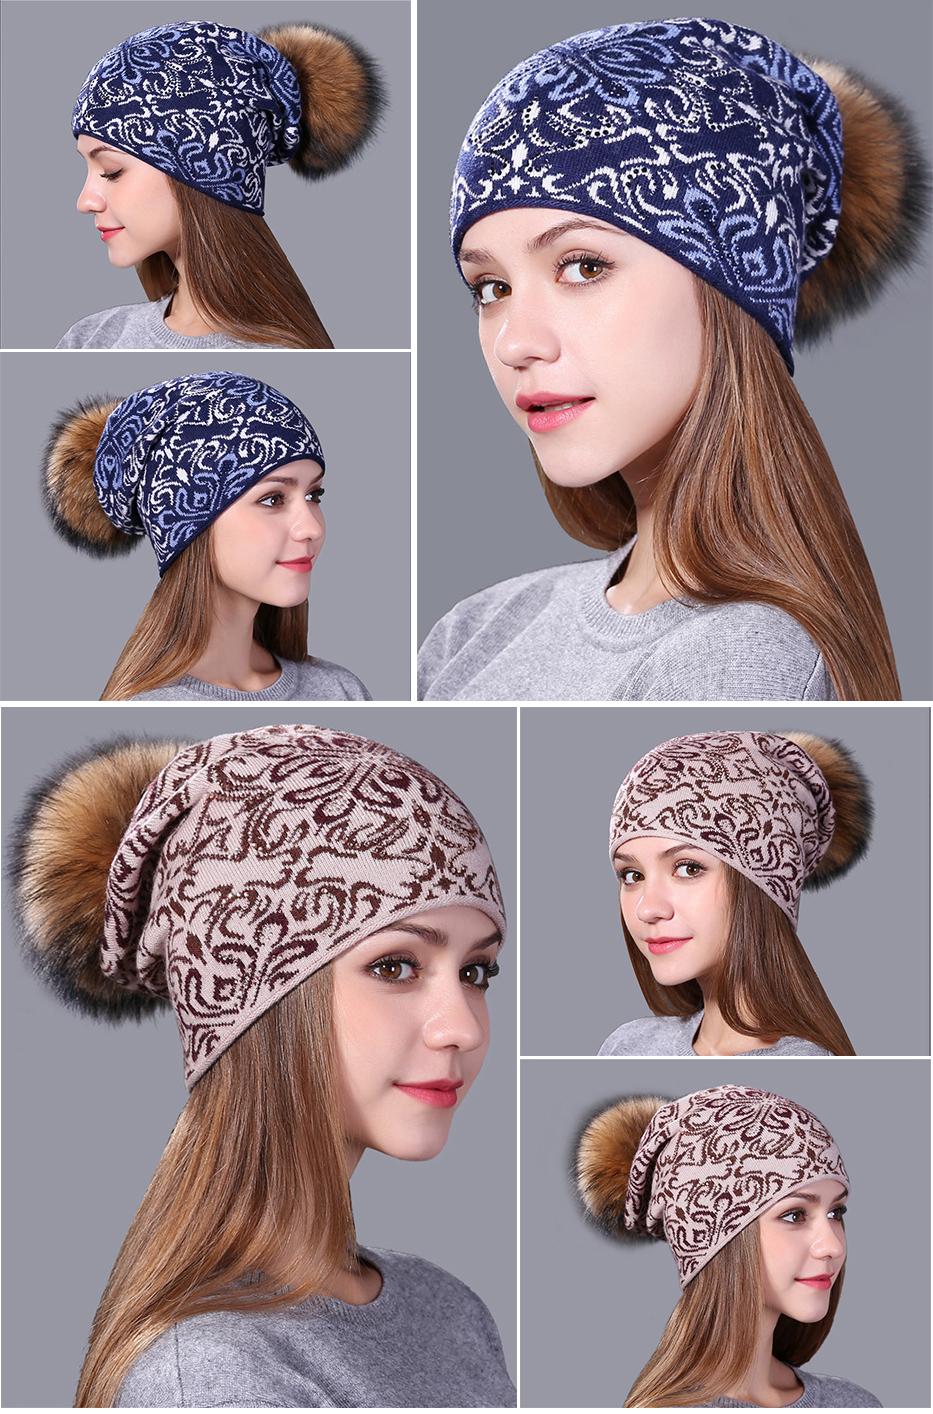 Compre Xthree China Bule E Estilo Branco De Lã De Malha Chapéu Do ... abe723c394d